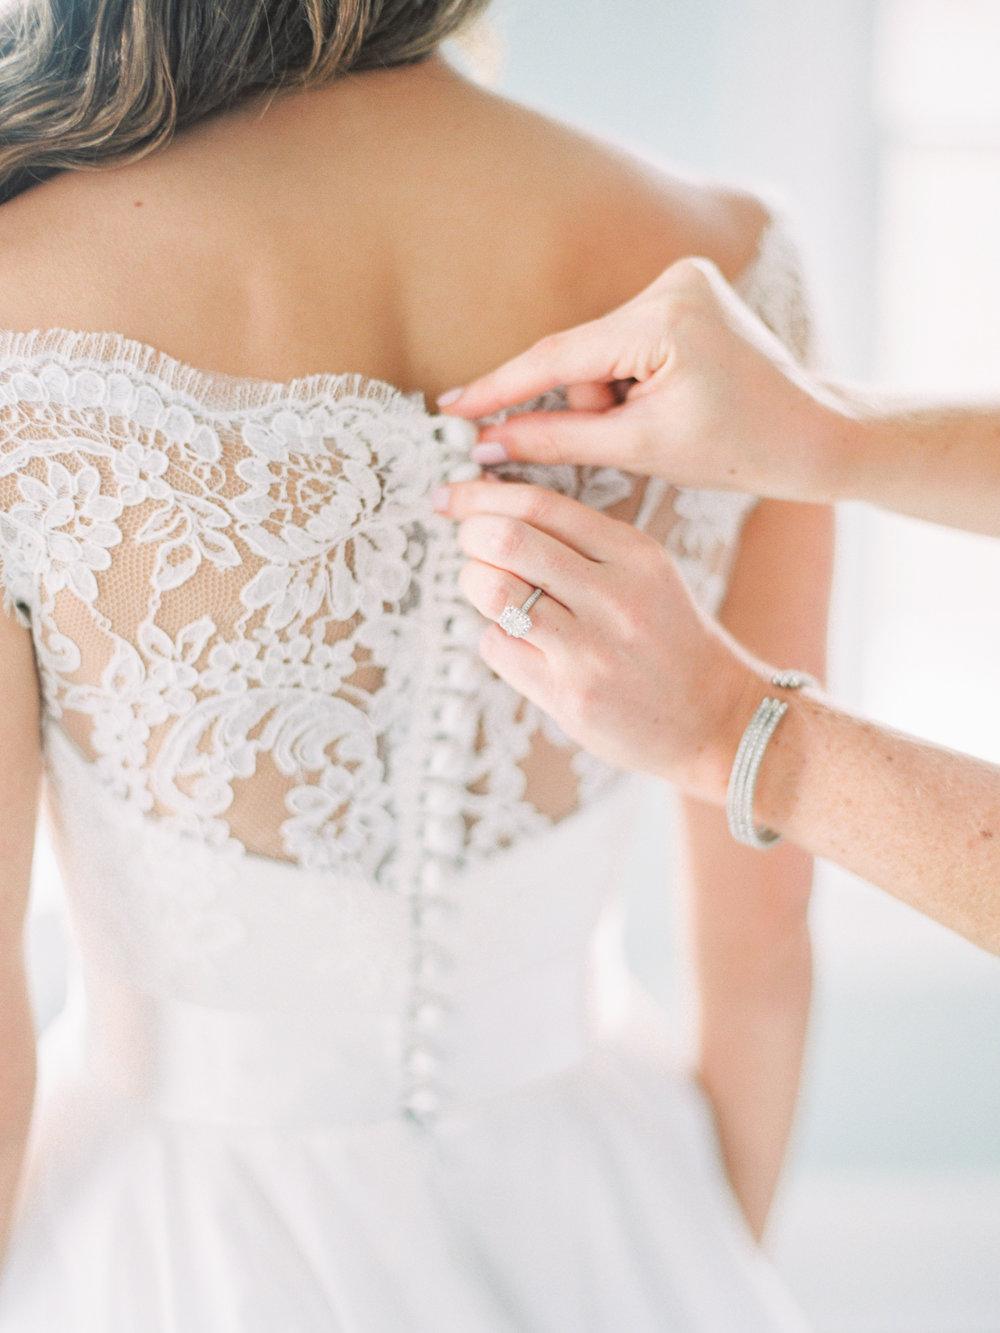 brianne&david_5.12.18_wedding-180.JPG